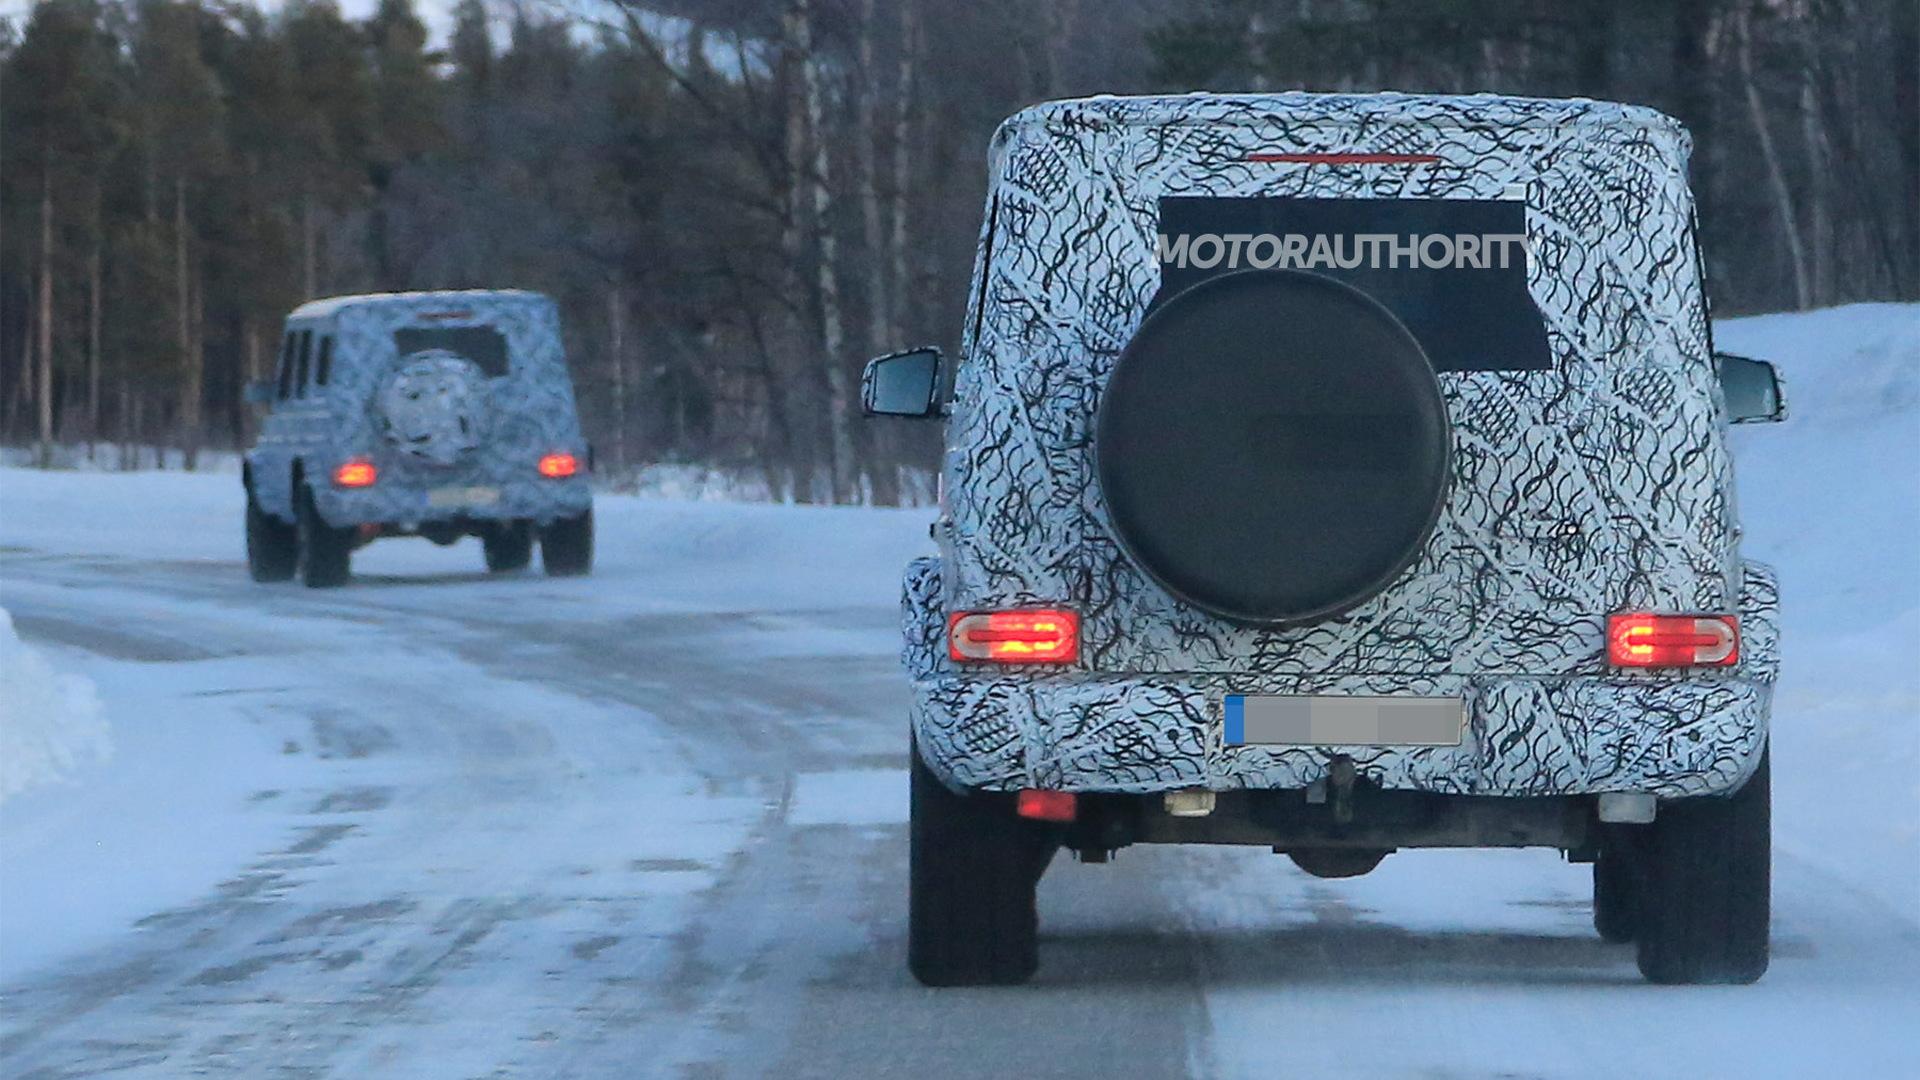 2019 Mercedes-AMG G63 spy shots - Image via S. Baldauf/SB-Medien